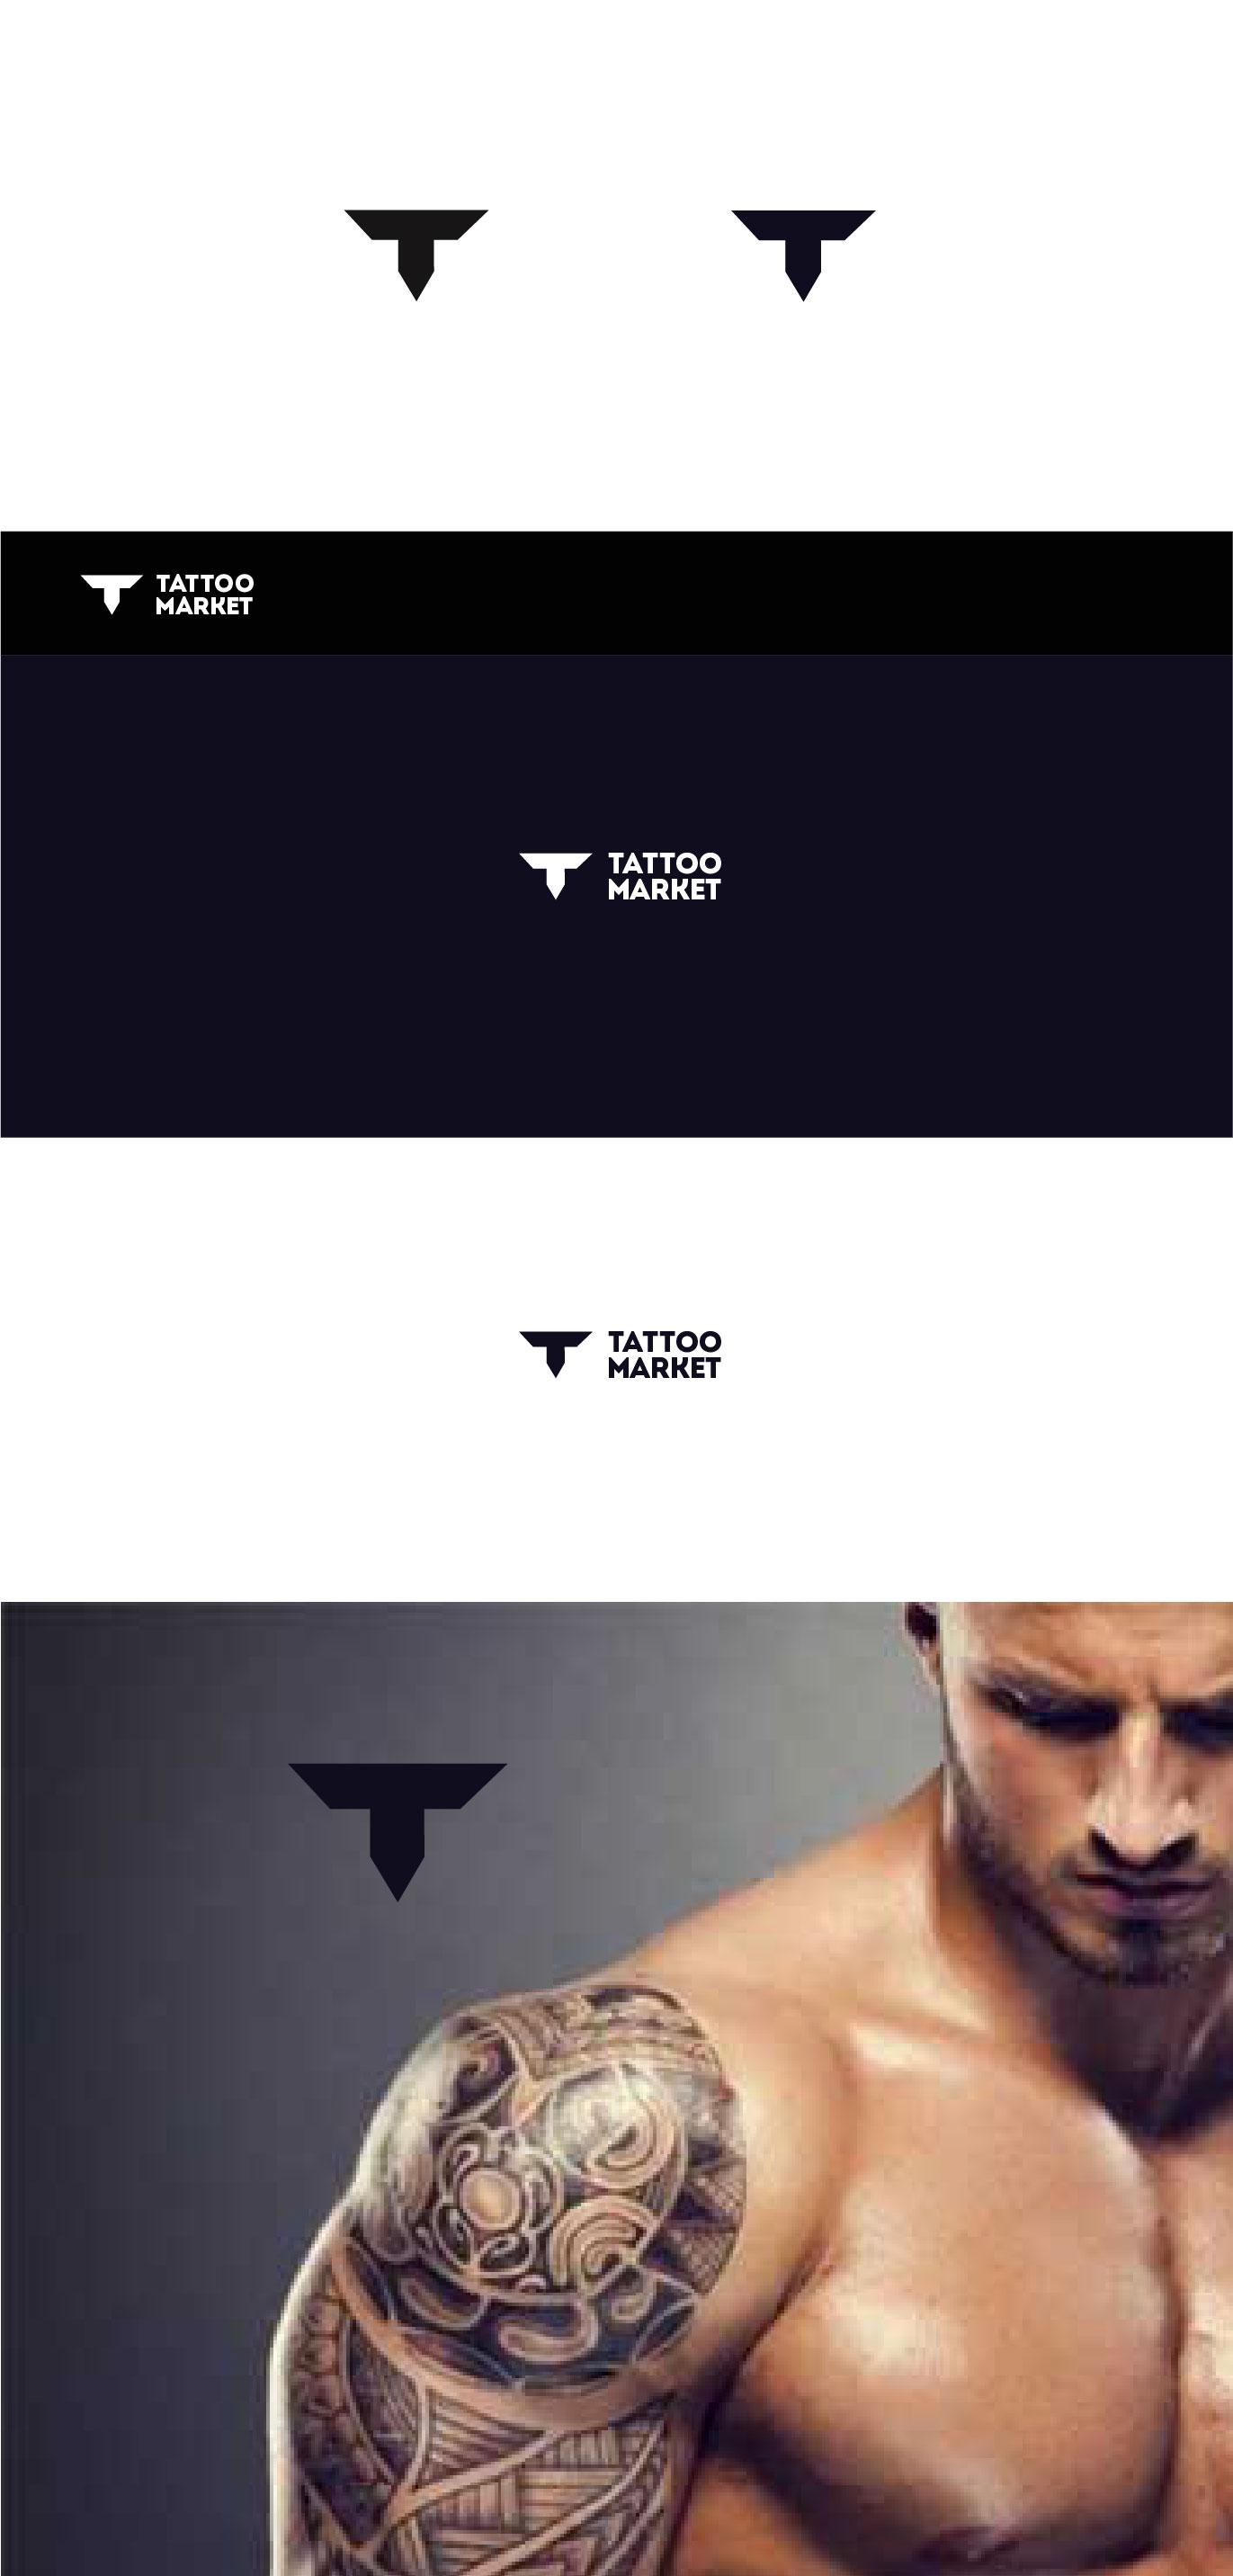 Редизайн логотипа магазина тату оборудования TattooMarket.ru фото f_5205c48cdcf04809.jpg